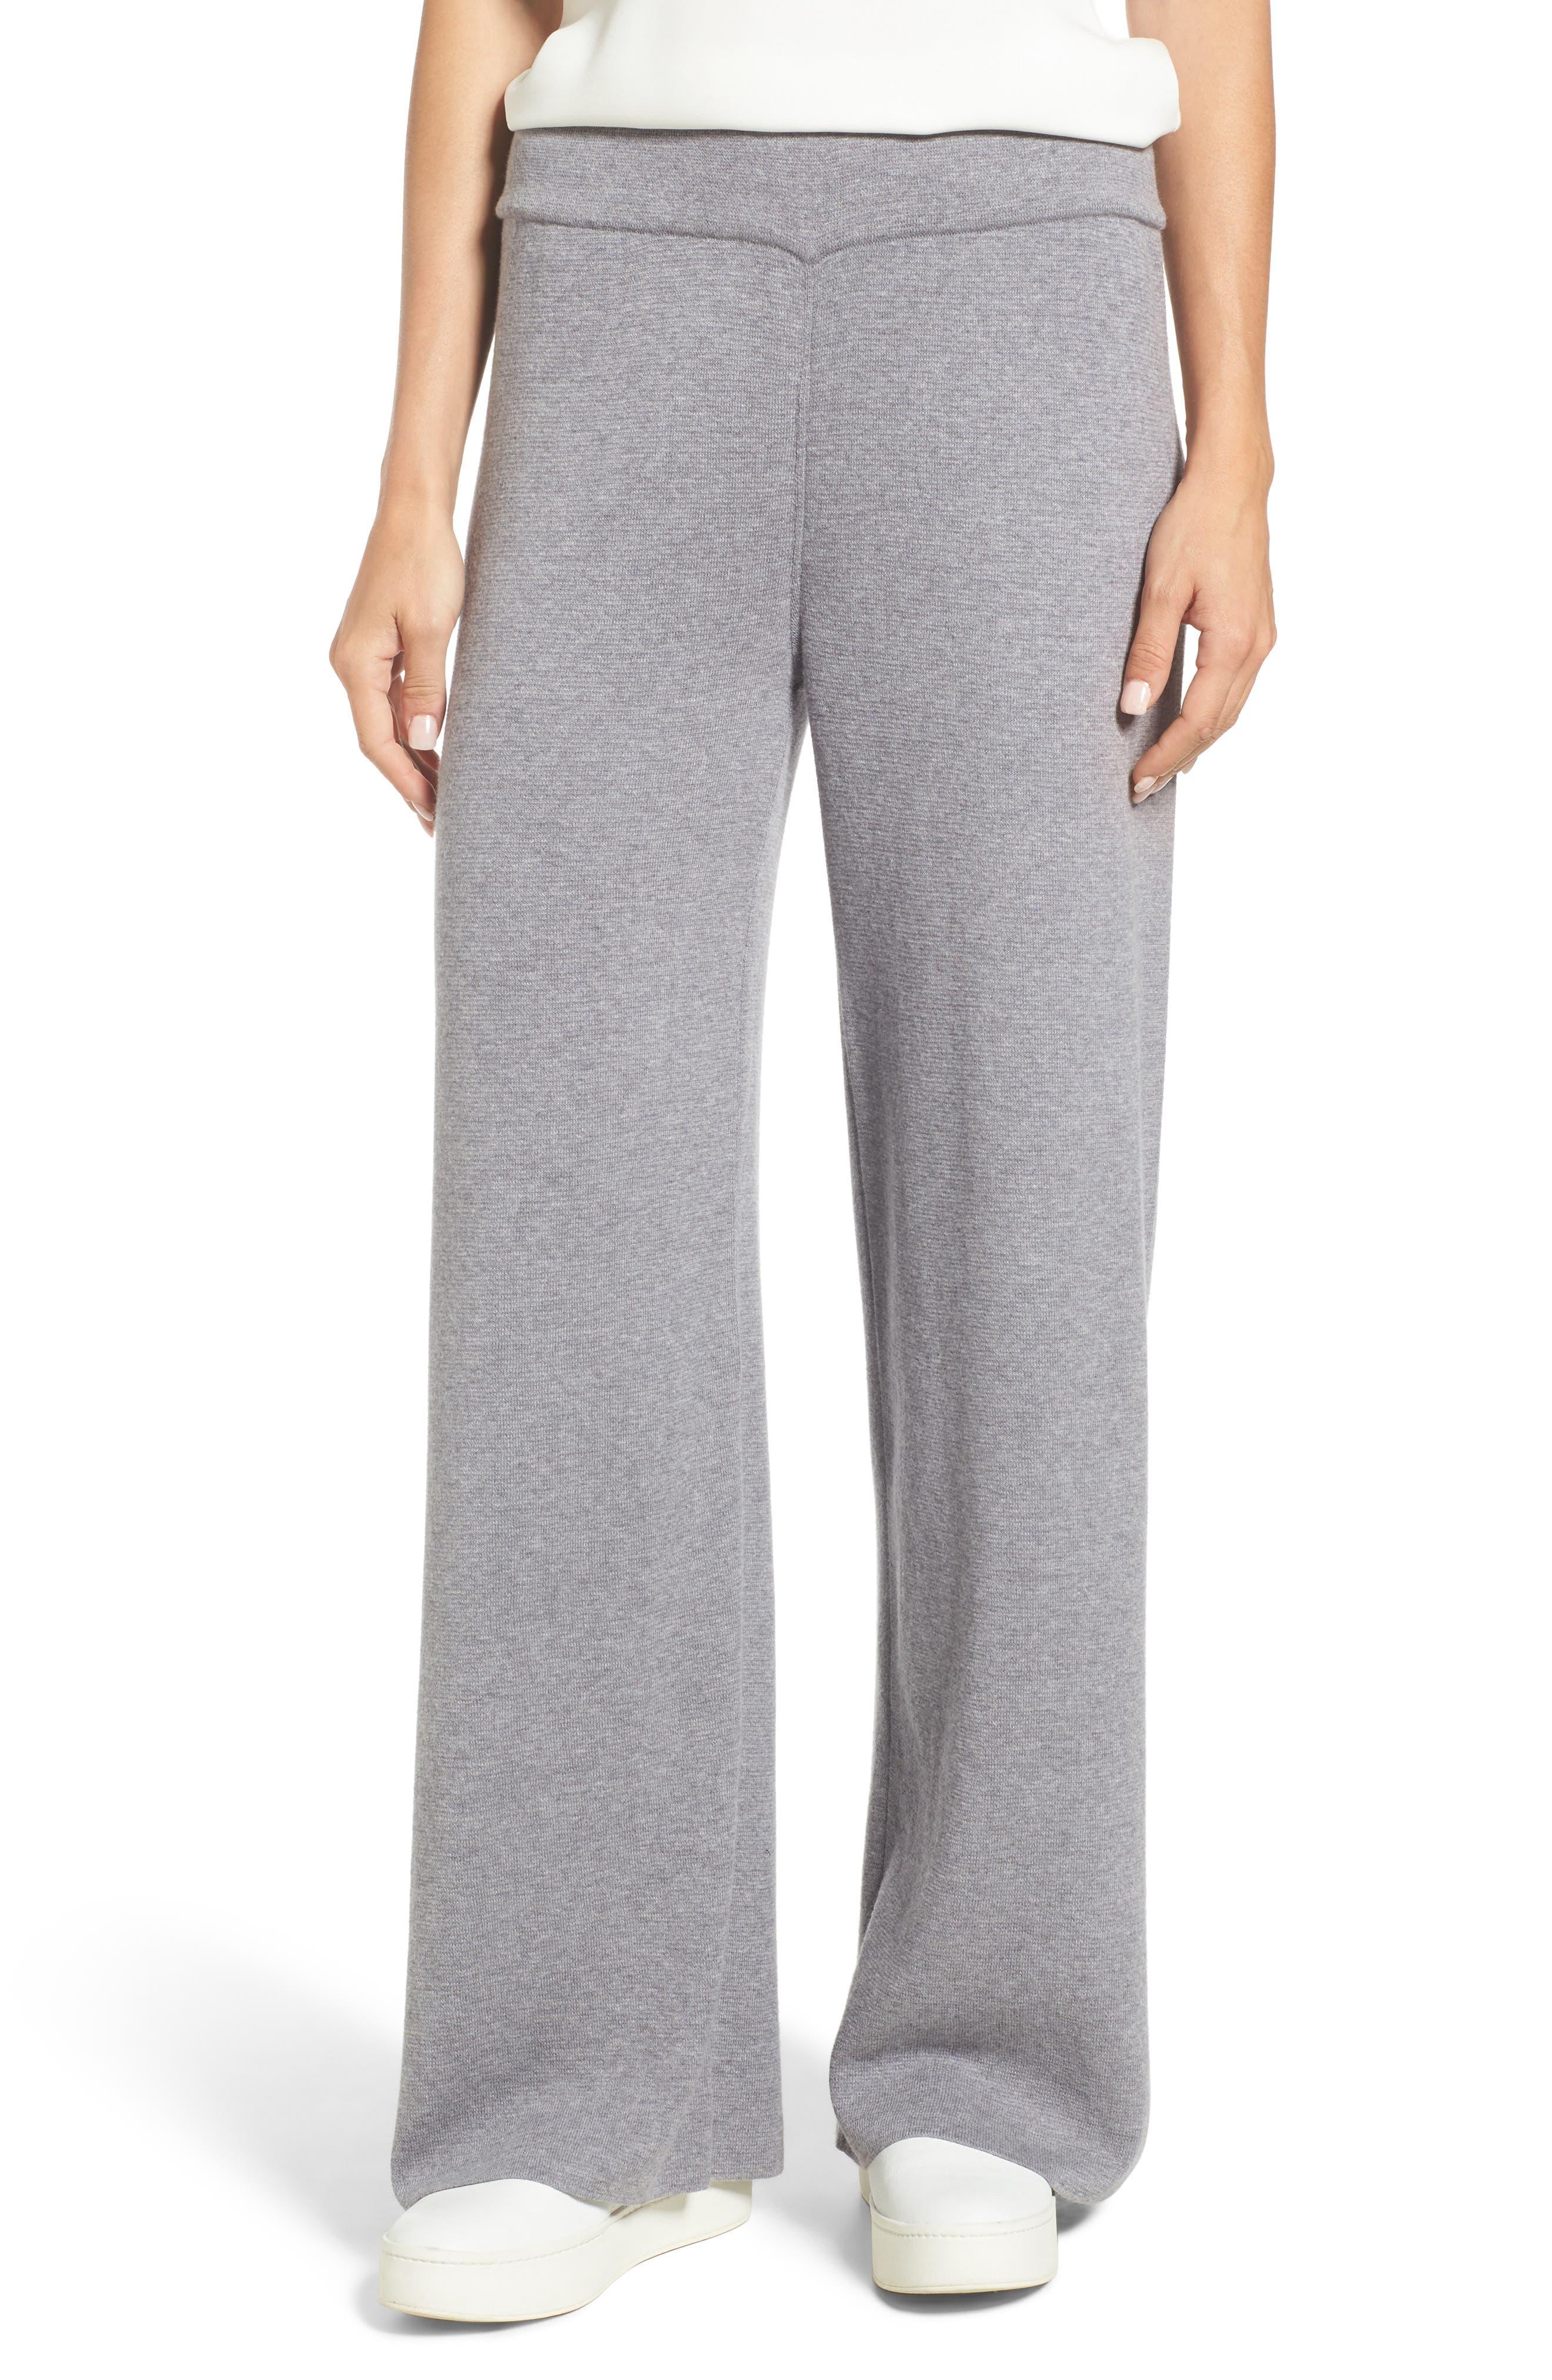 Alternate Image 1 Selected - NIC+ZOE Heathered Knit Pants